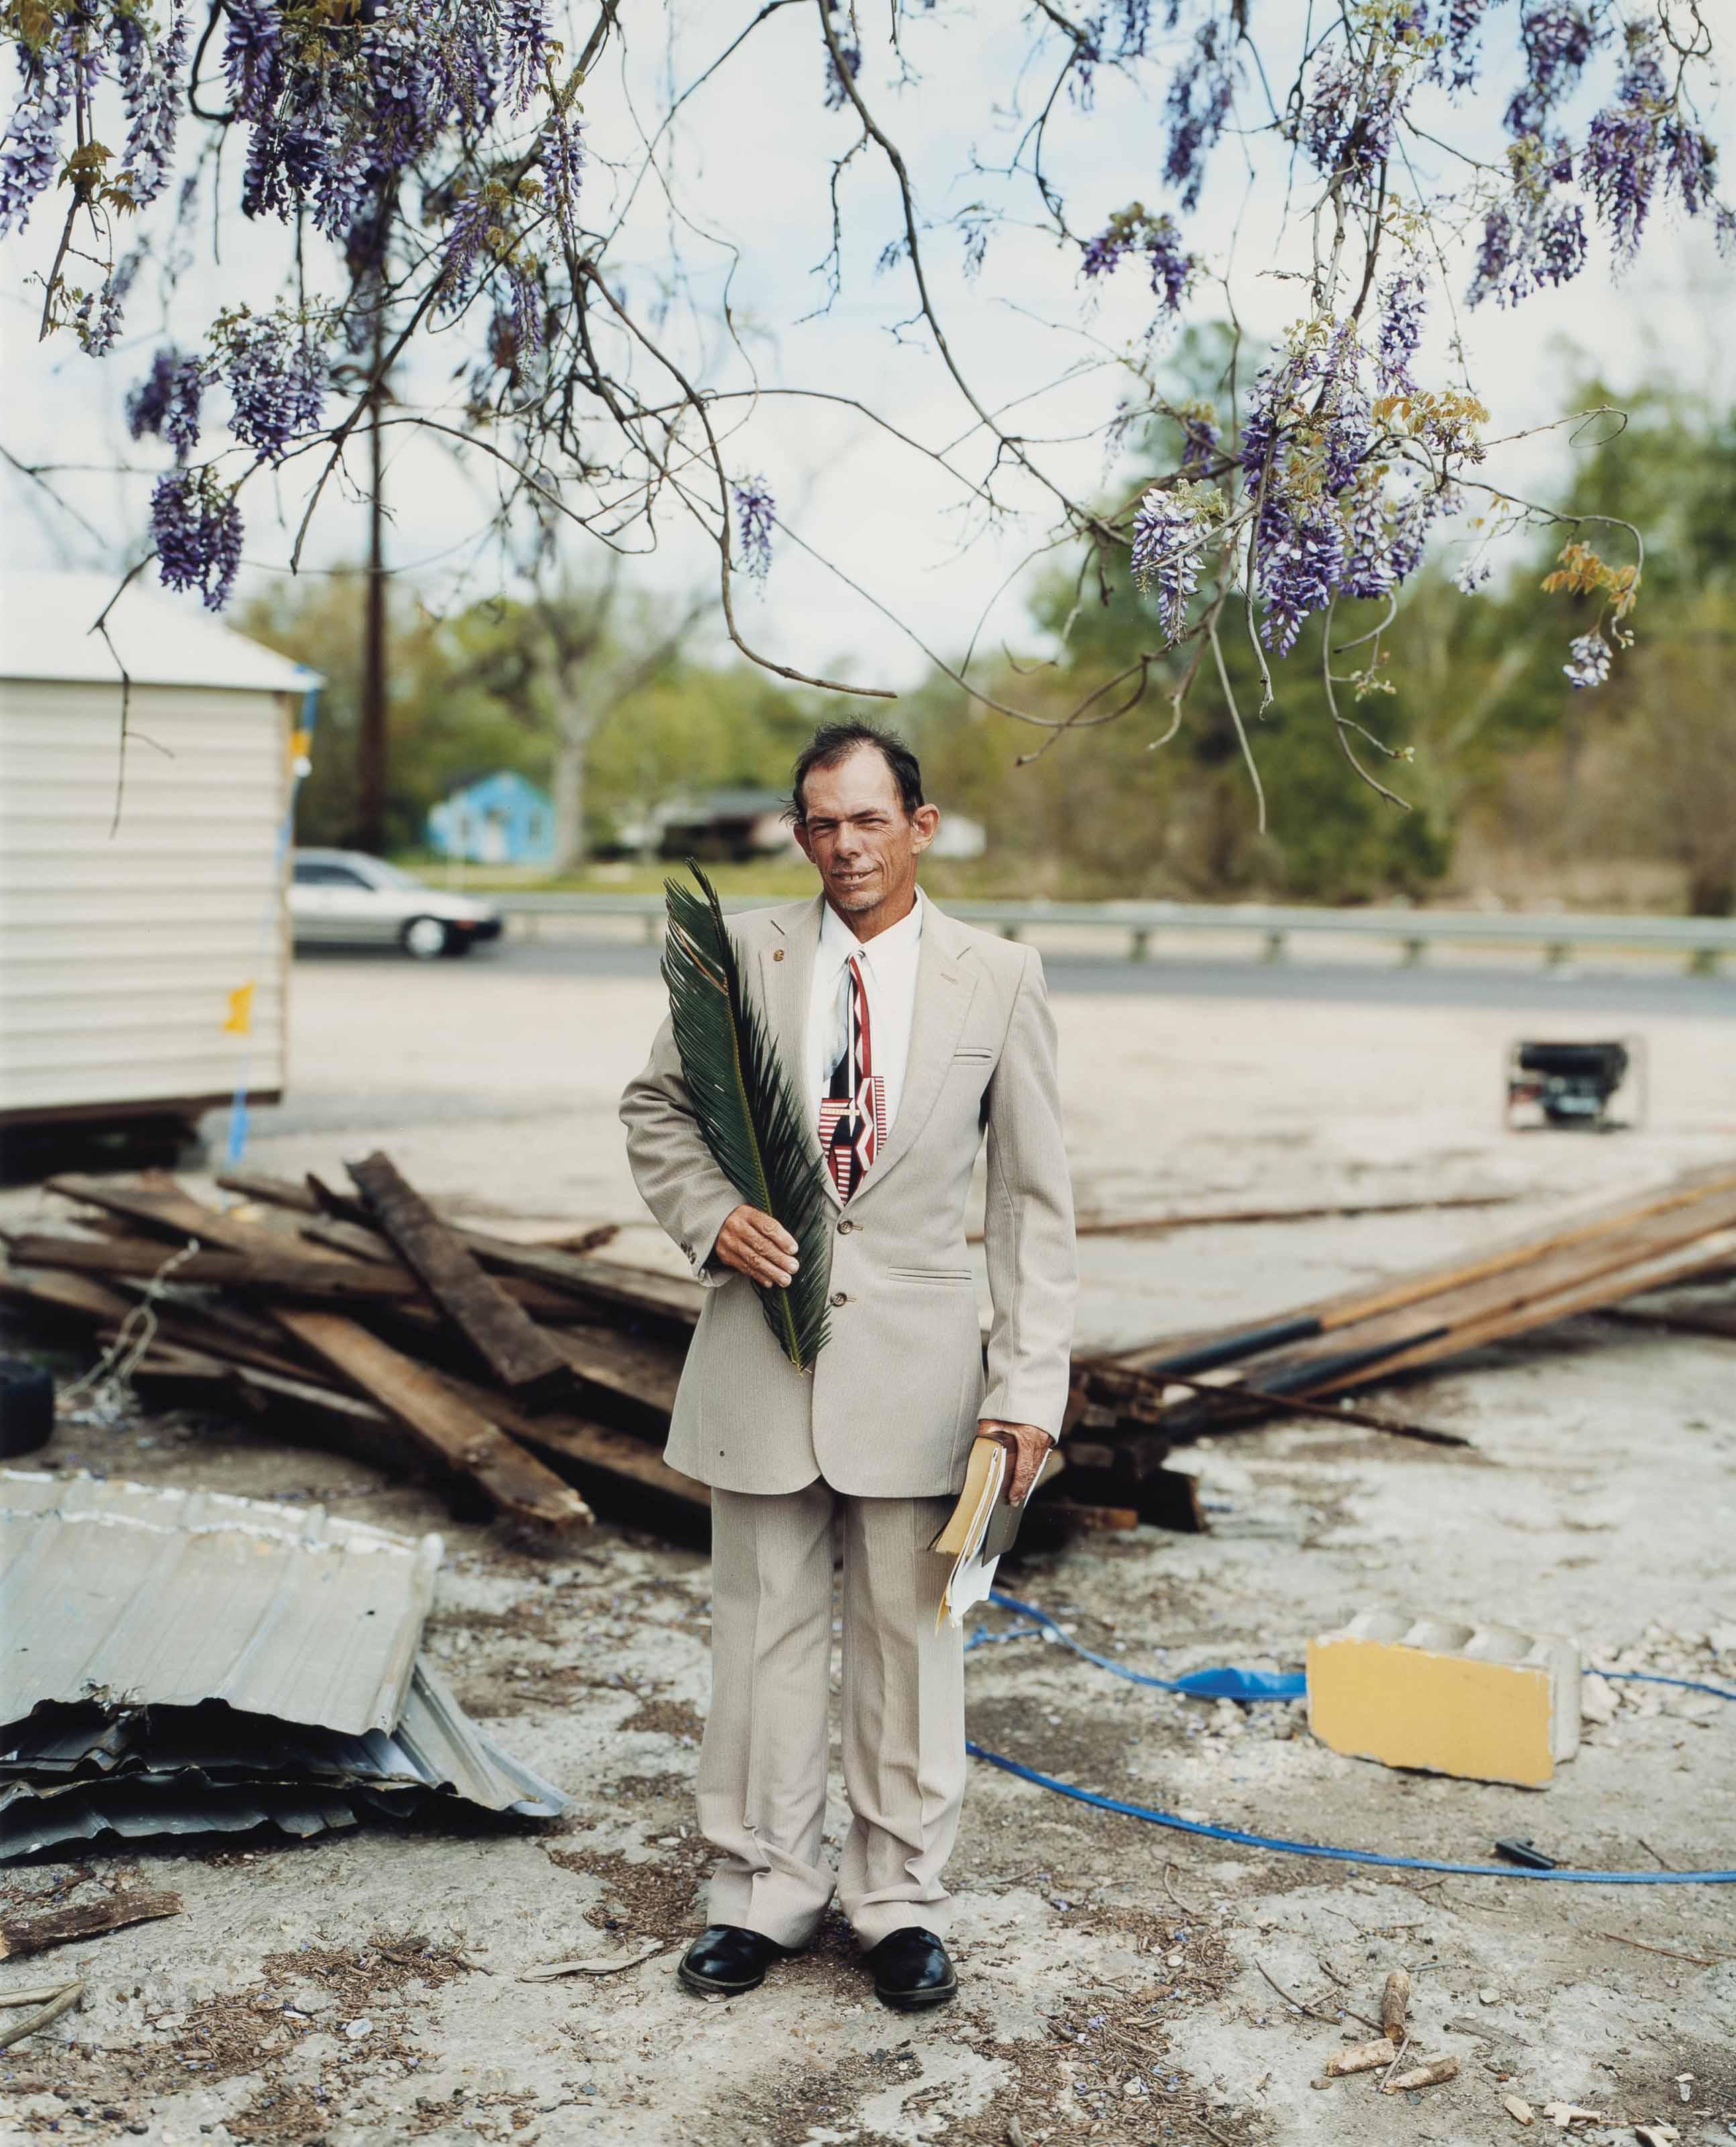 Patrick, Palm Sunday, Baton Rouge, LA, 2002